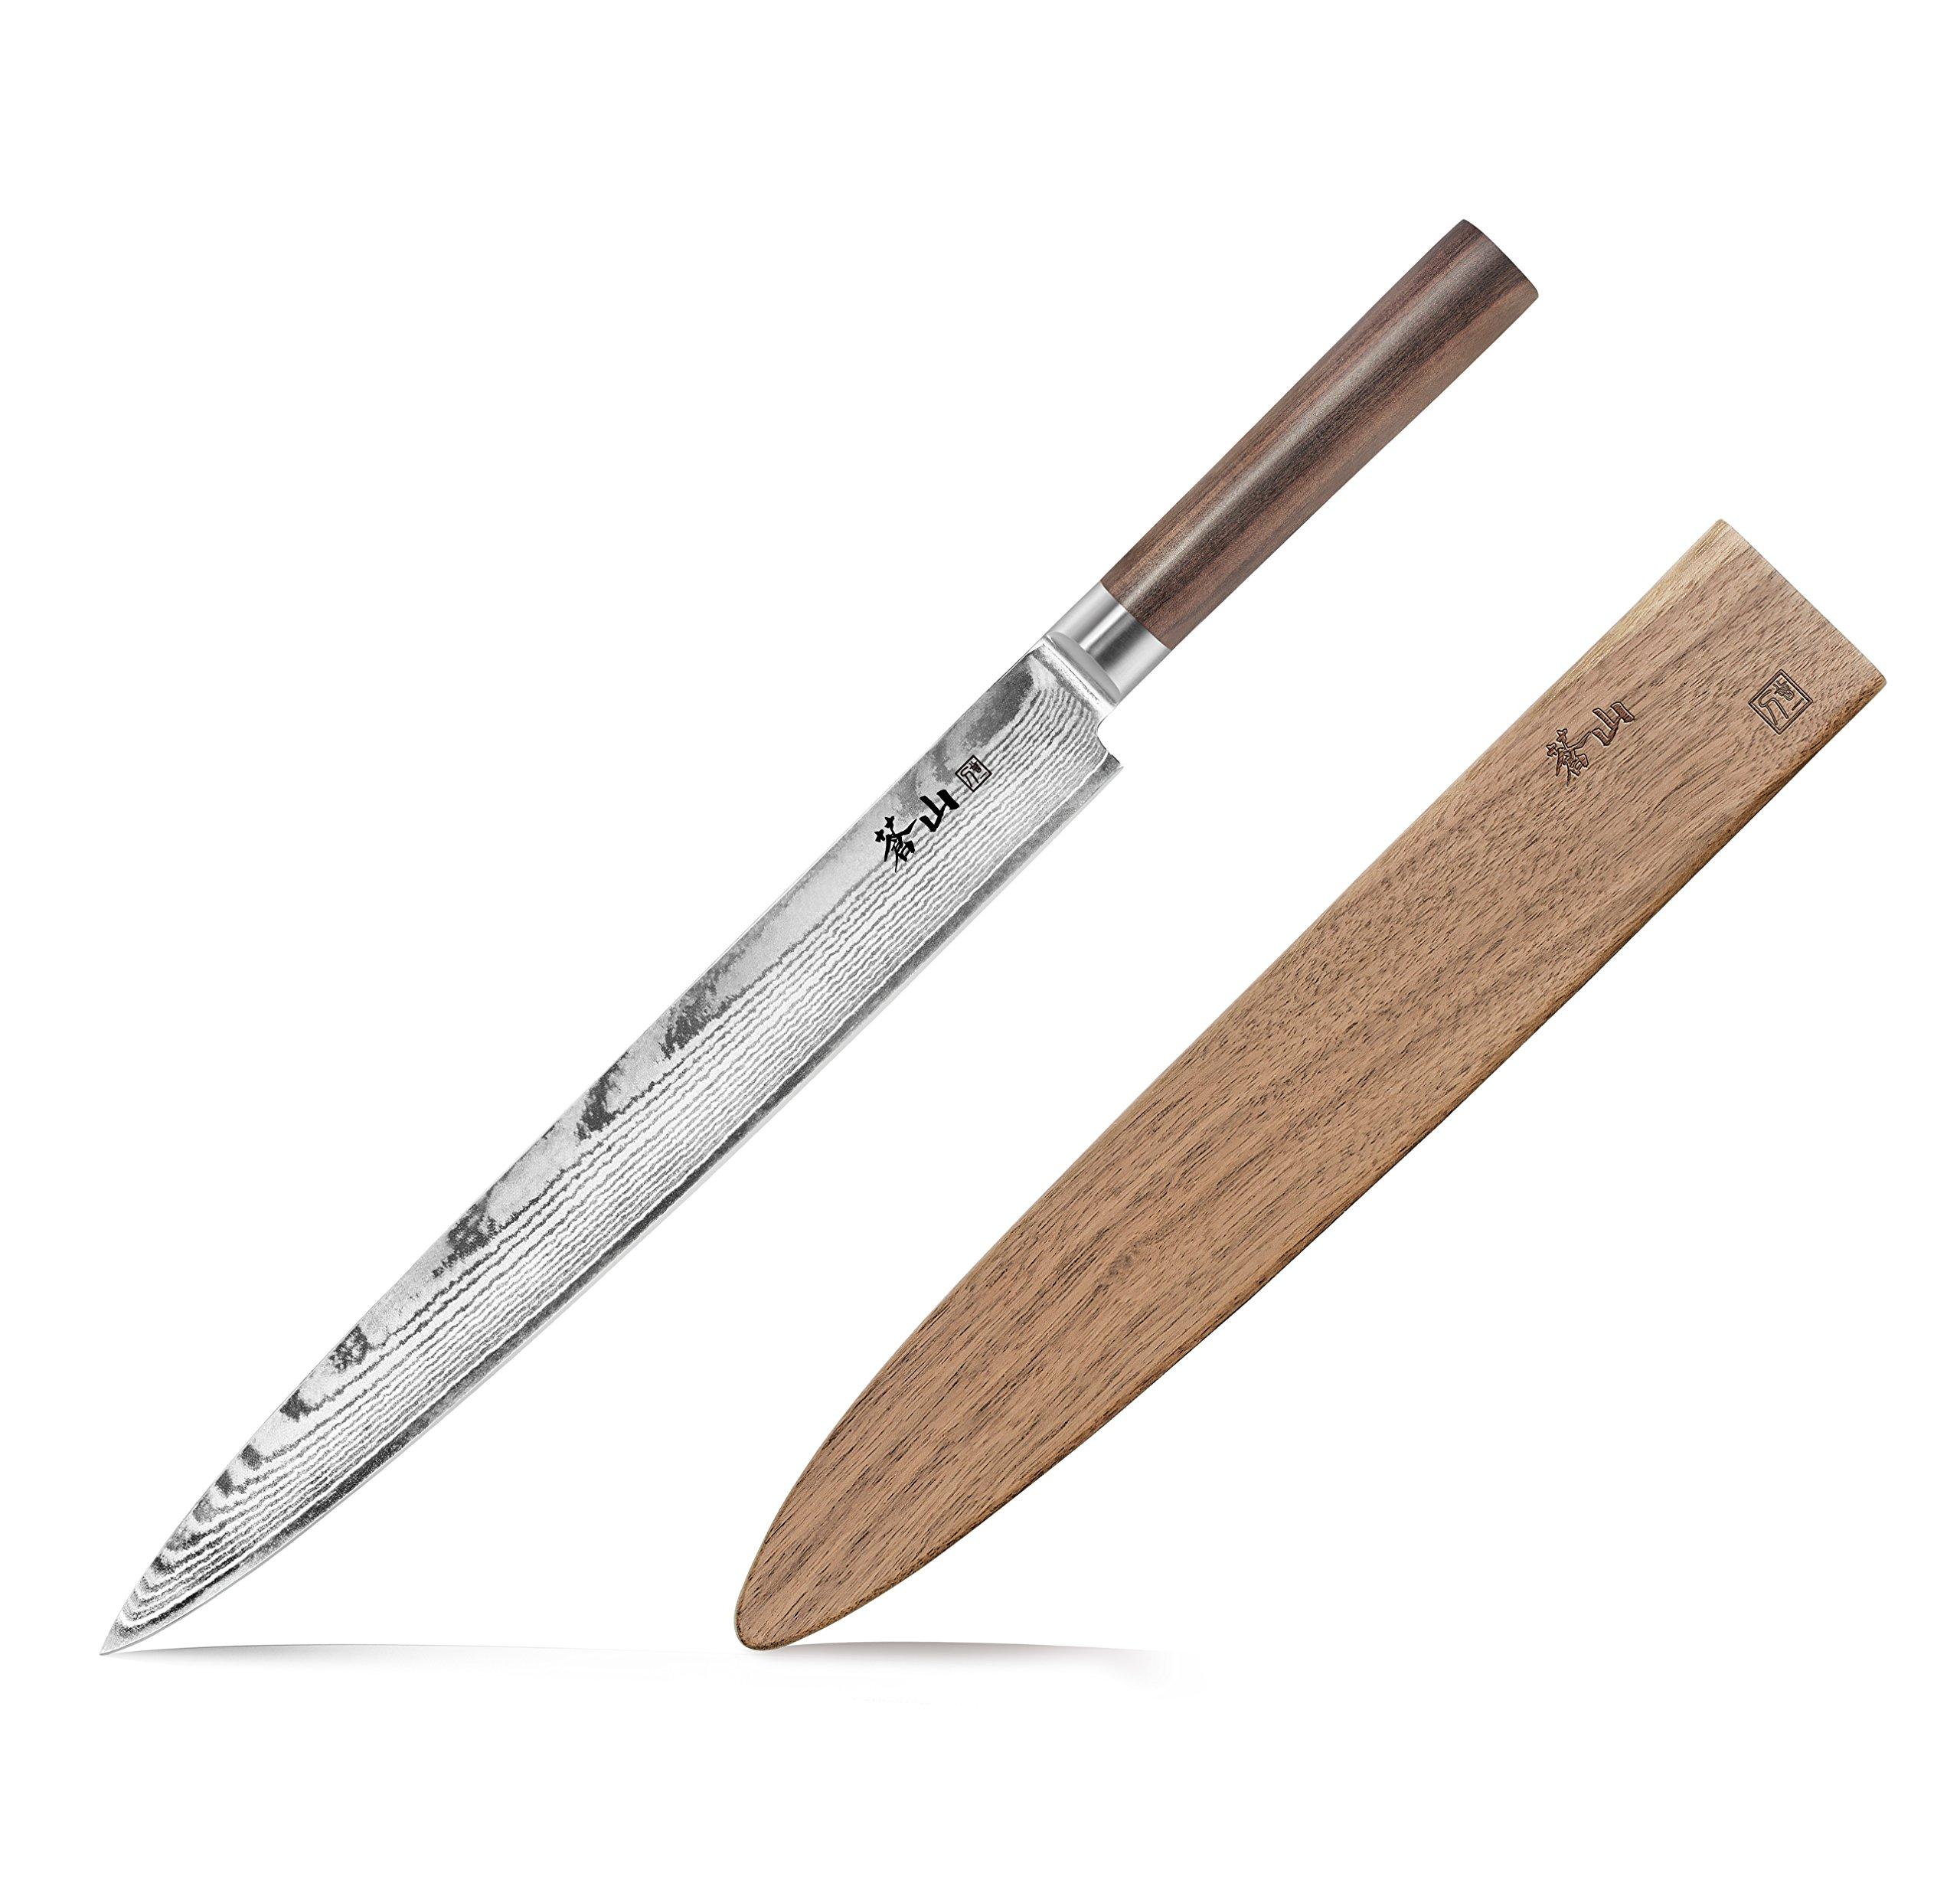 Cangshan J Series 62793 Japan VG-10 Forged Sashimi Chef Knife With Walnut Sheath, 12-Inch